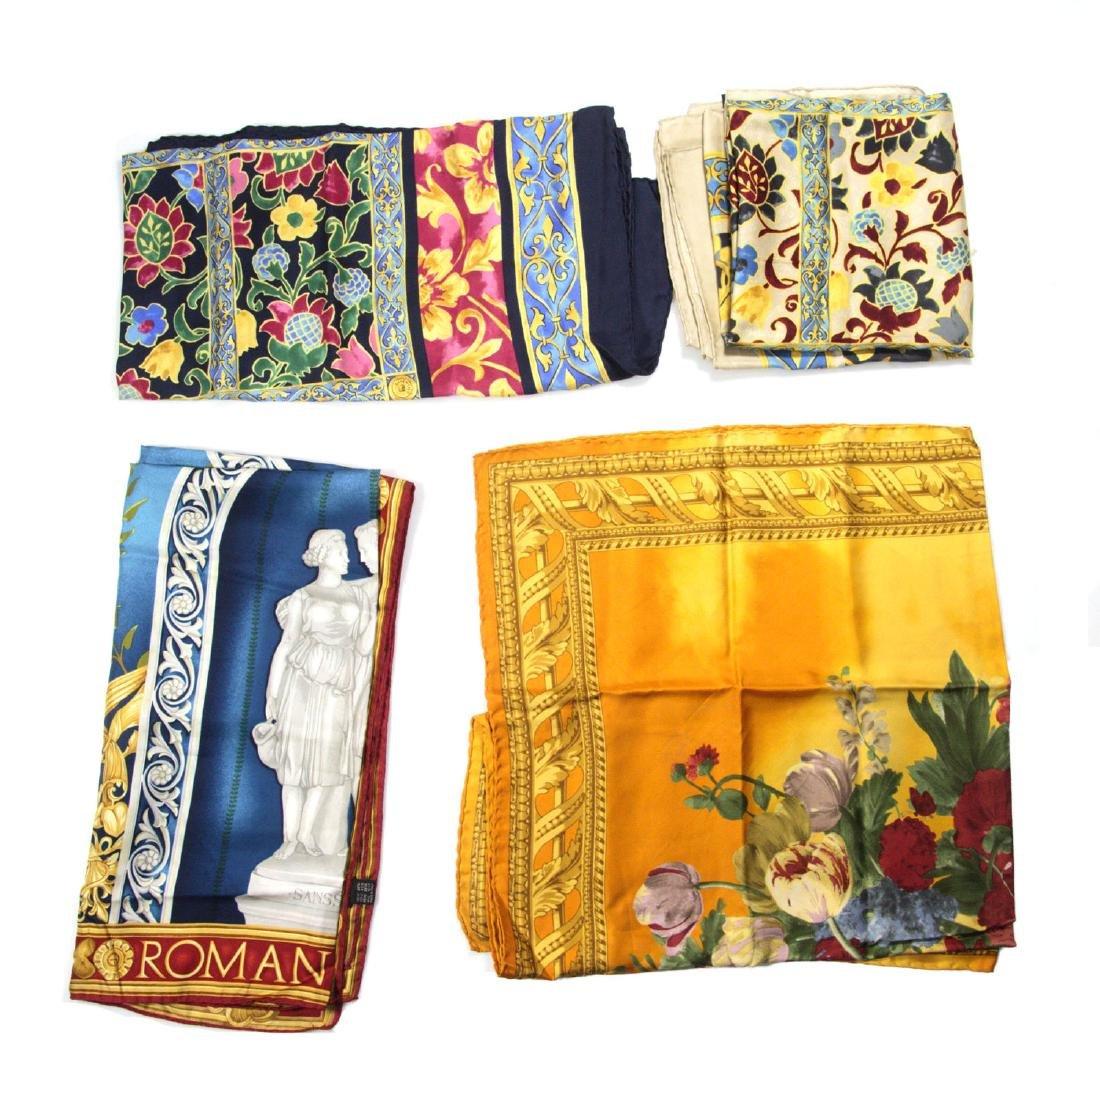 Four Silk Scarves - Givenchy, Gianfranco Ferre, Joop!